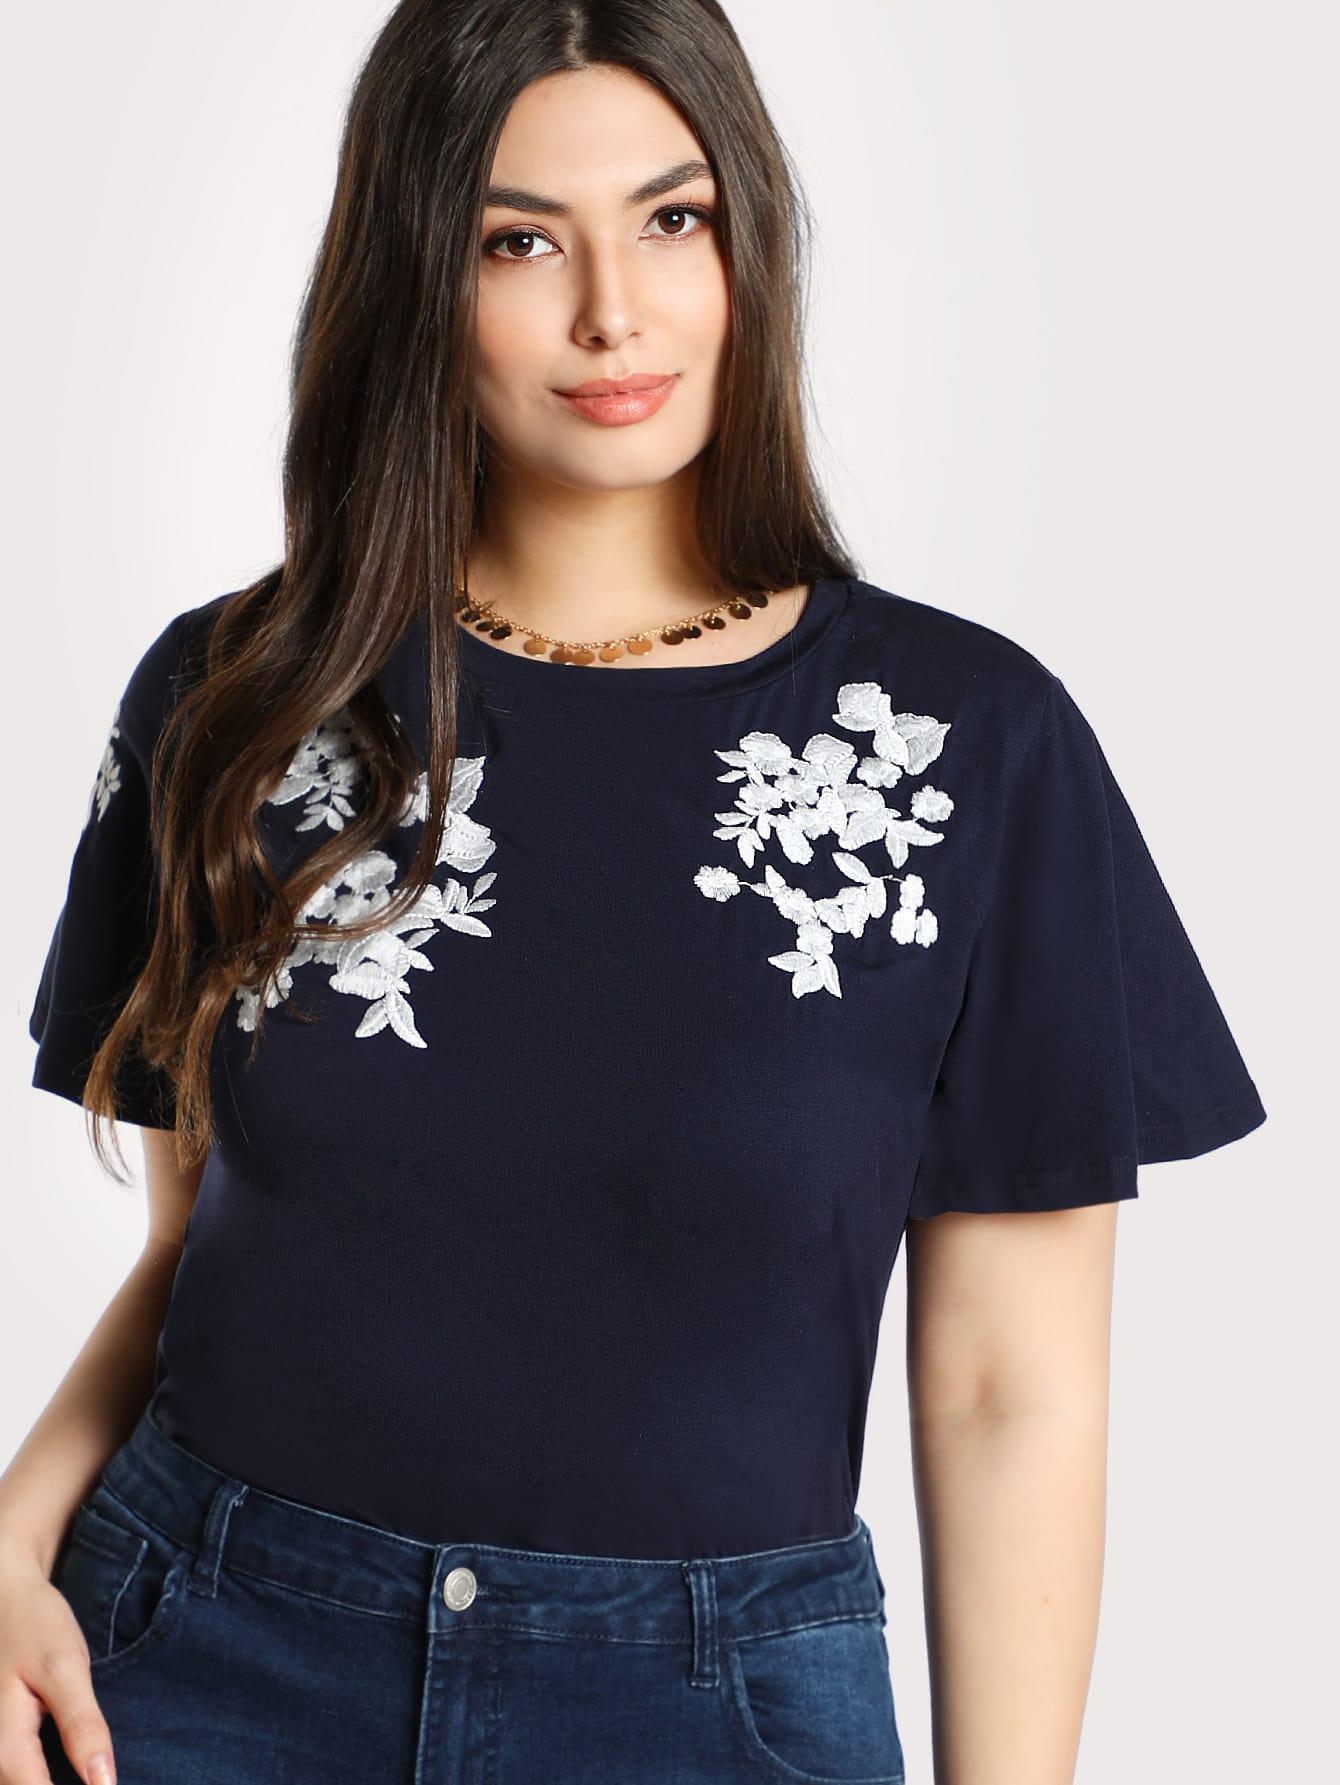 Flower Embroidered T-shirt redfox футболка flower t 42 4300 желтый